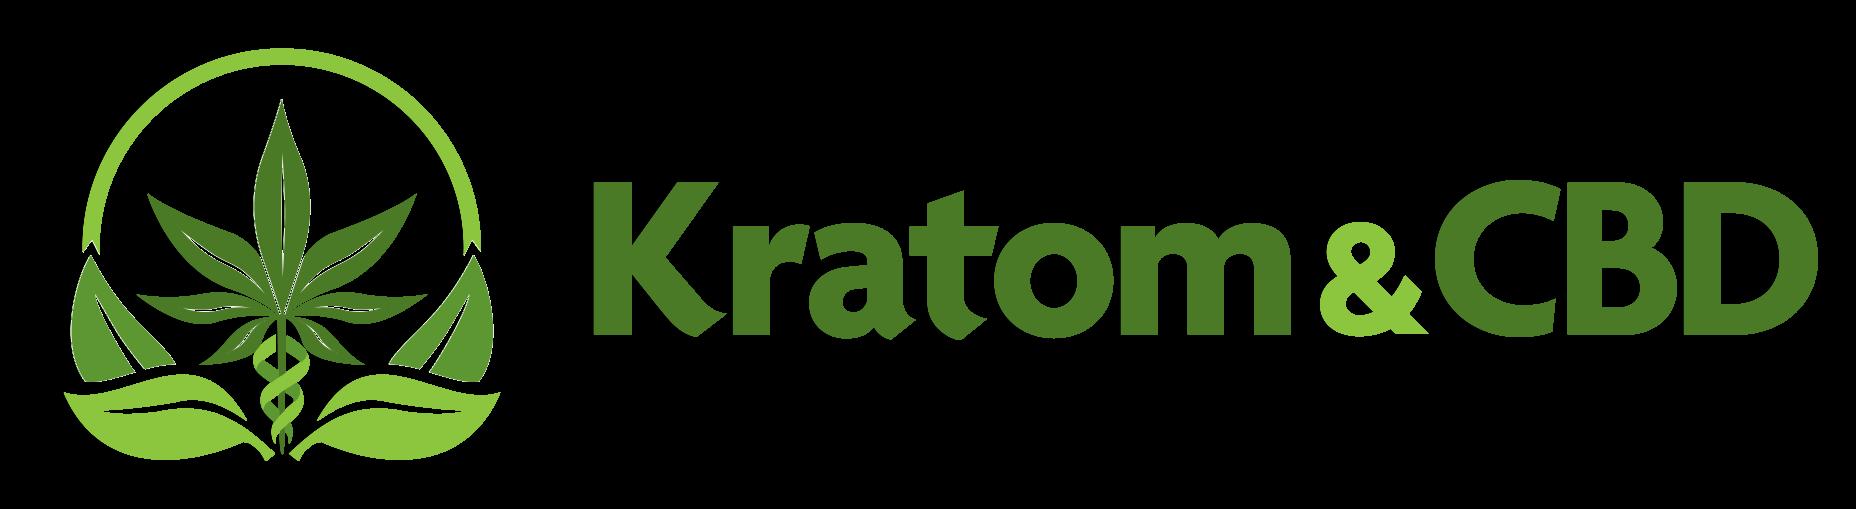 Kratom & CBD Faire Preise & Beste Qualität